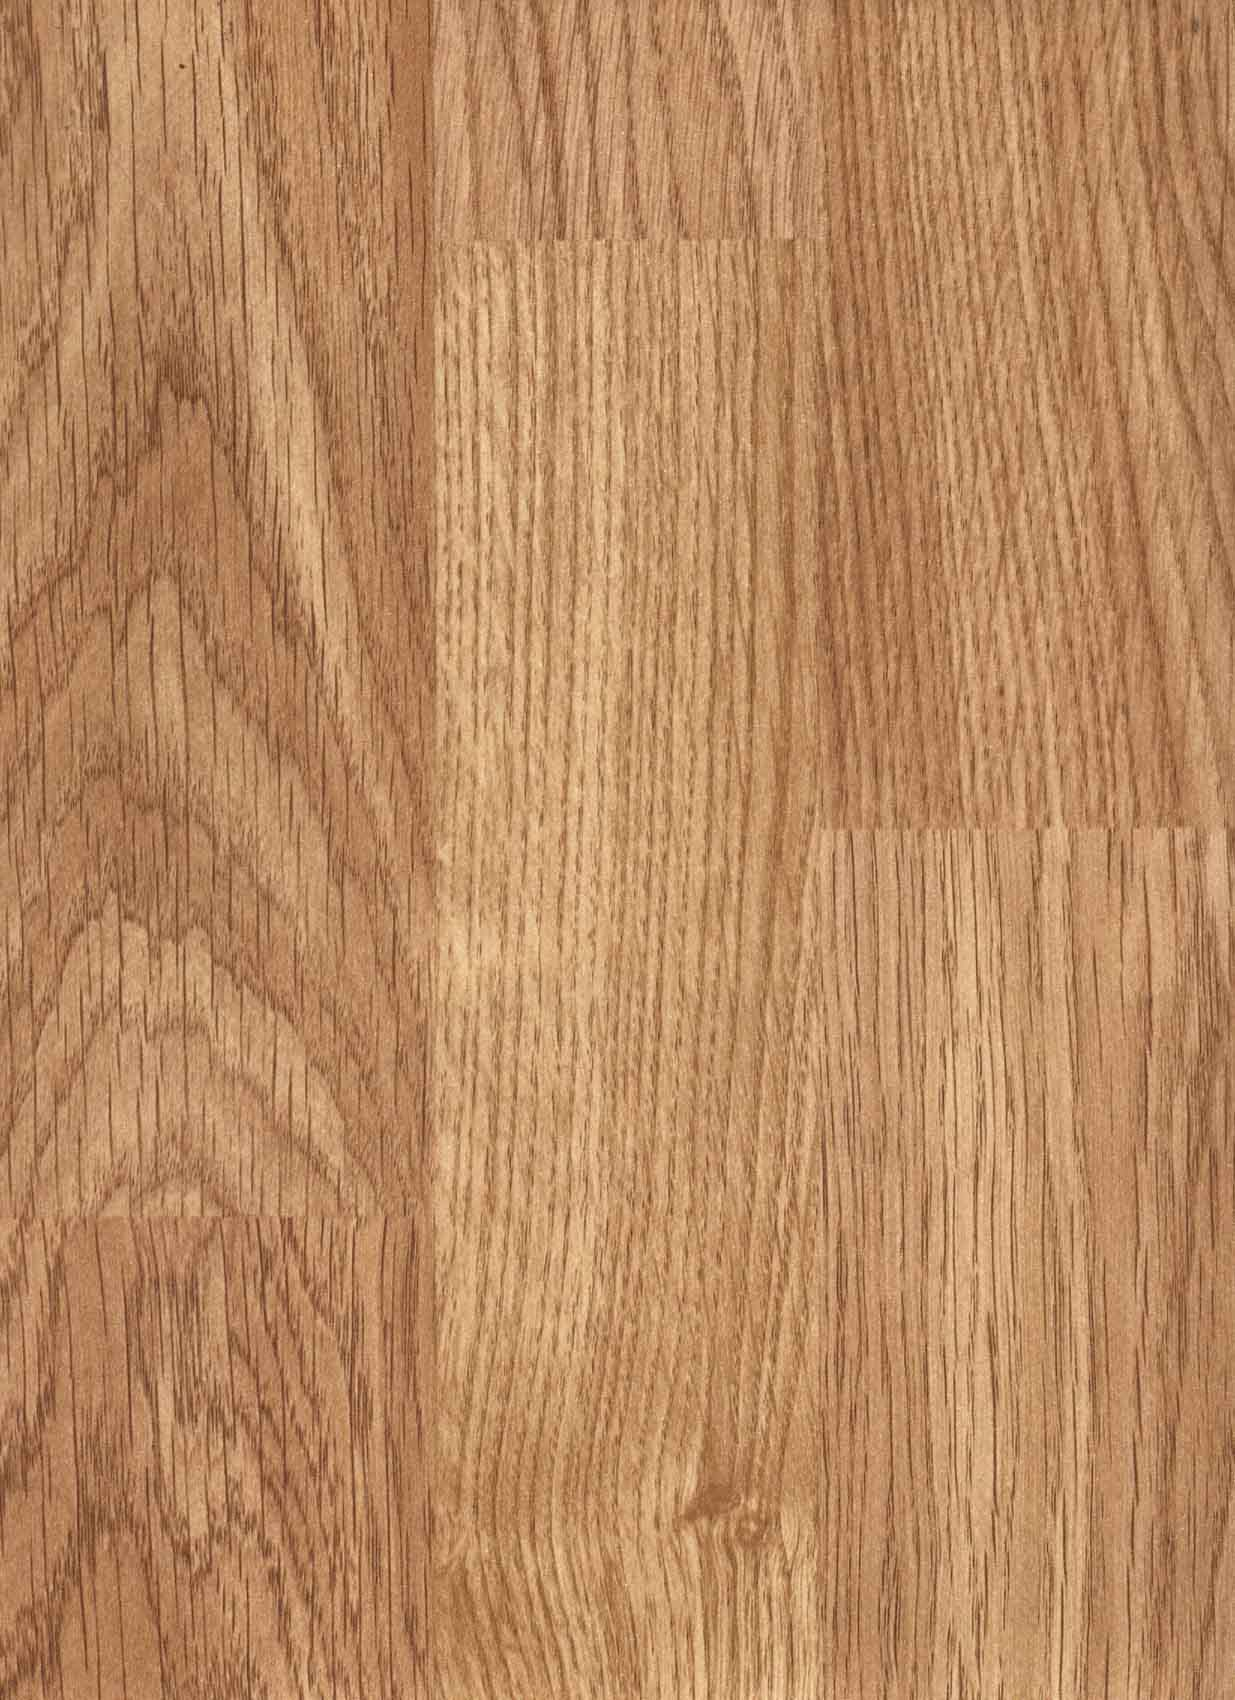 laminate flooring laminate flooringlaminated floor